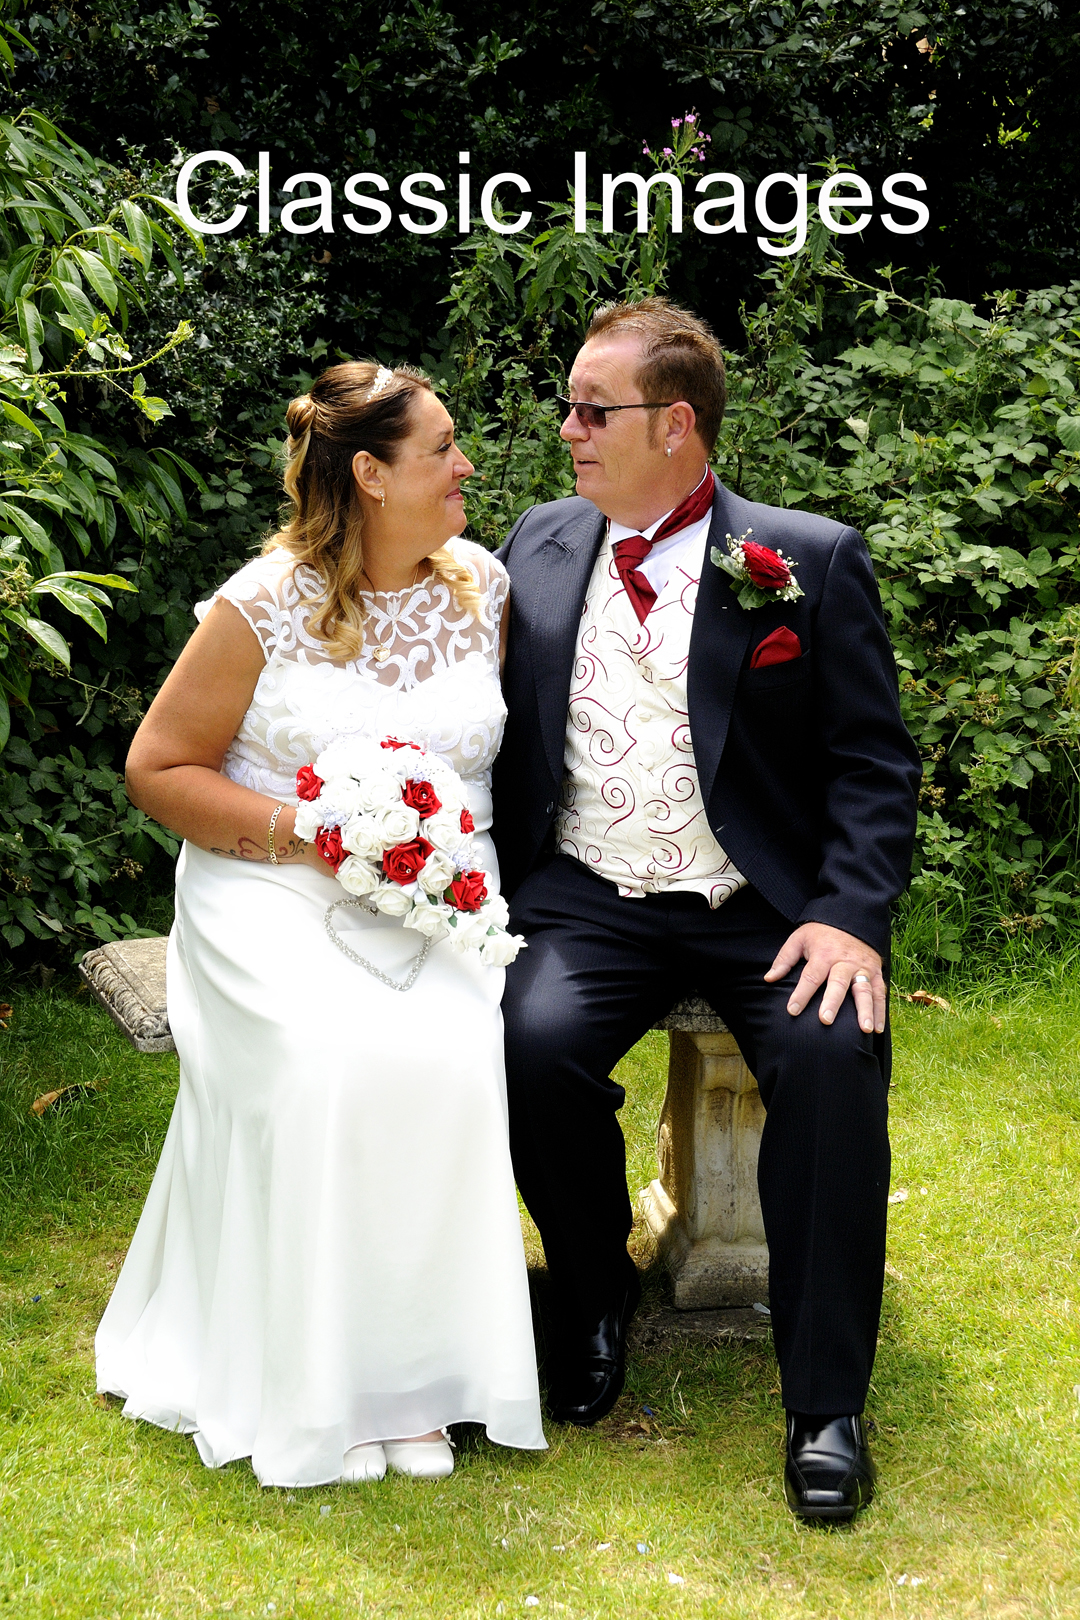 stunning-wedding-photos-classic-images-sunbury-weybridge